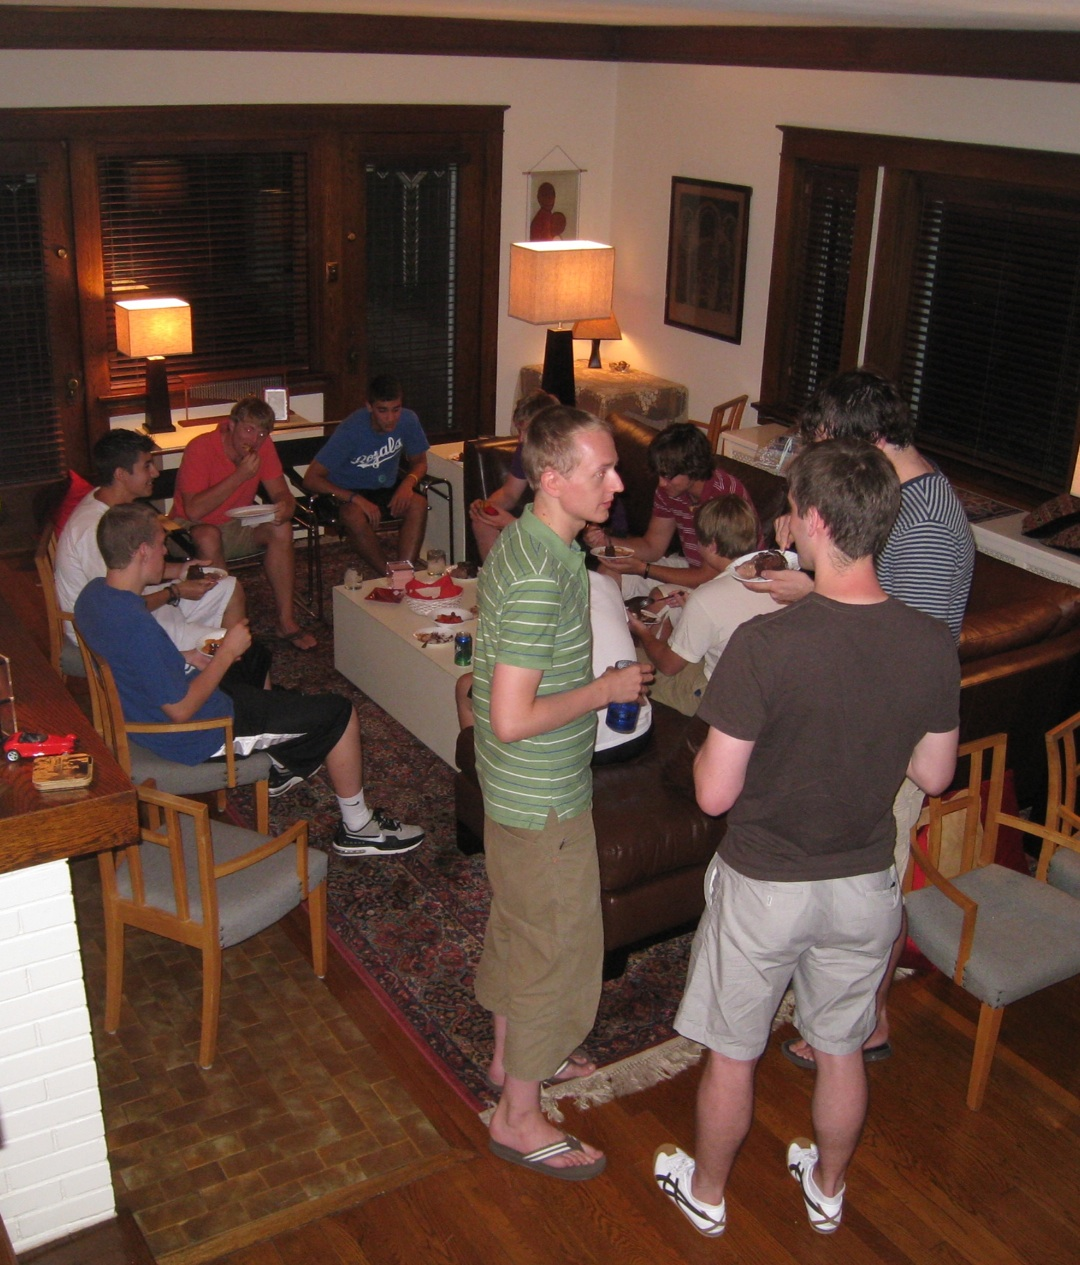 http://2.bp.blogspot.com/_Dc7jZhZEWu0/TGiLwkpB4OI/AAAAAAAAHDQ/E0WZcHdXXPg/s1600/Pizza+party+for+Jonas+email+size.jpg